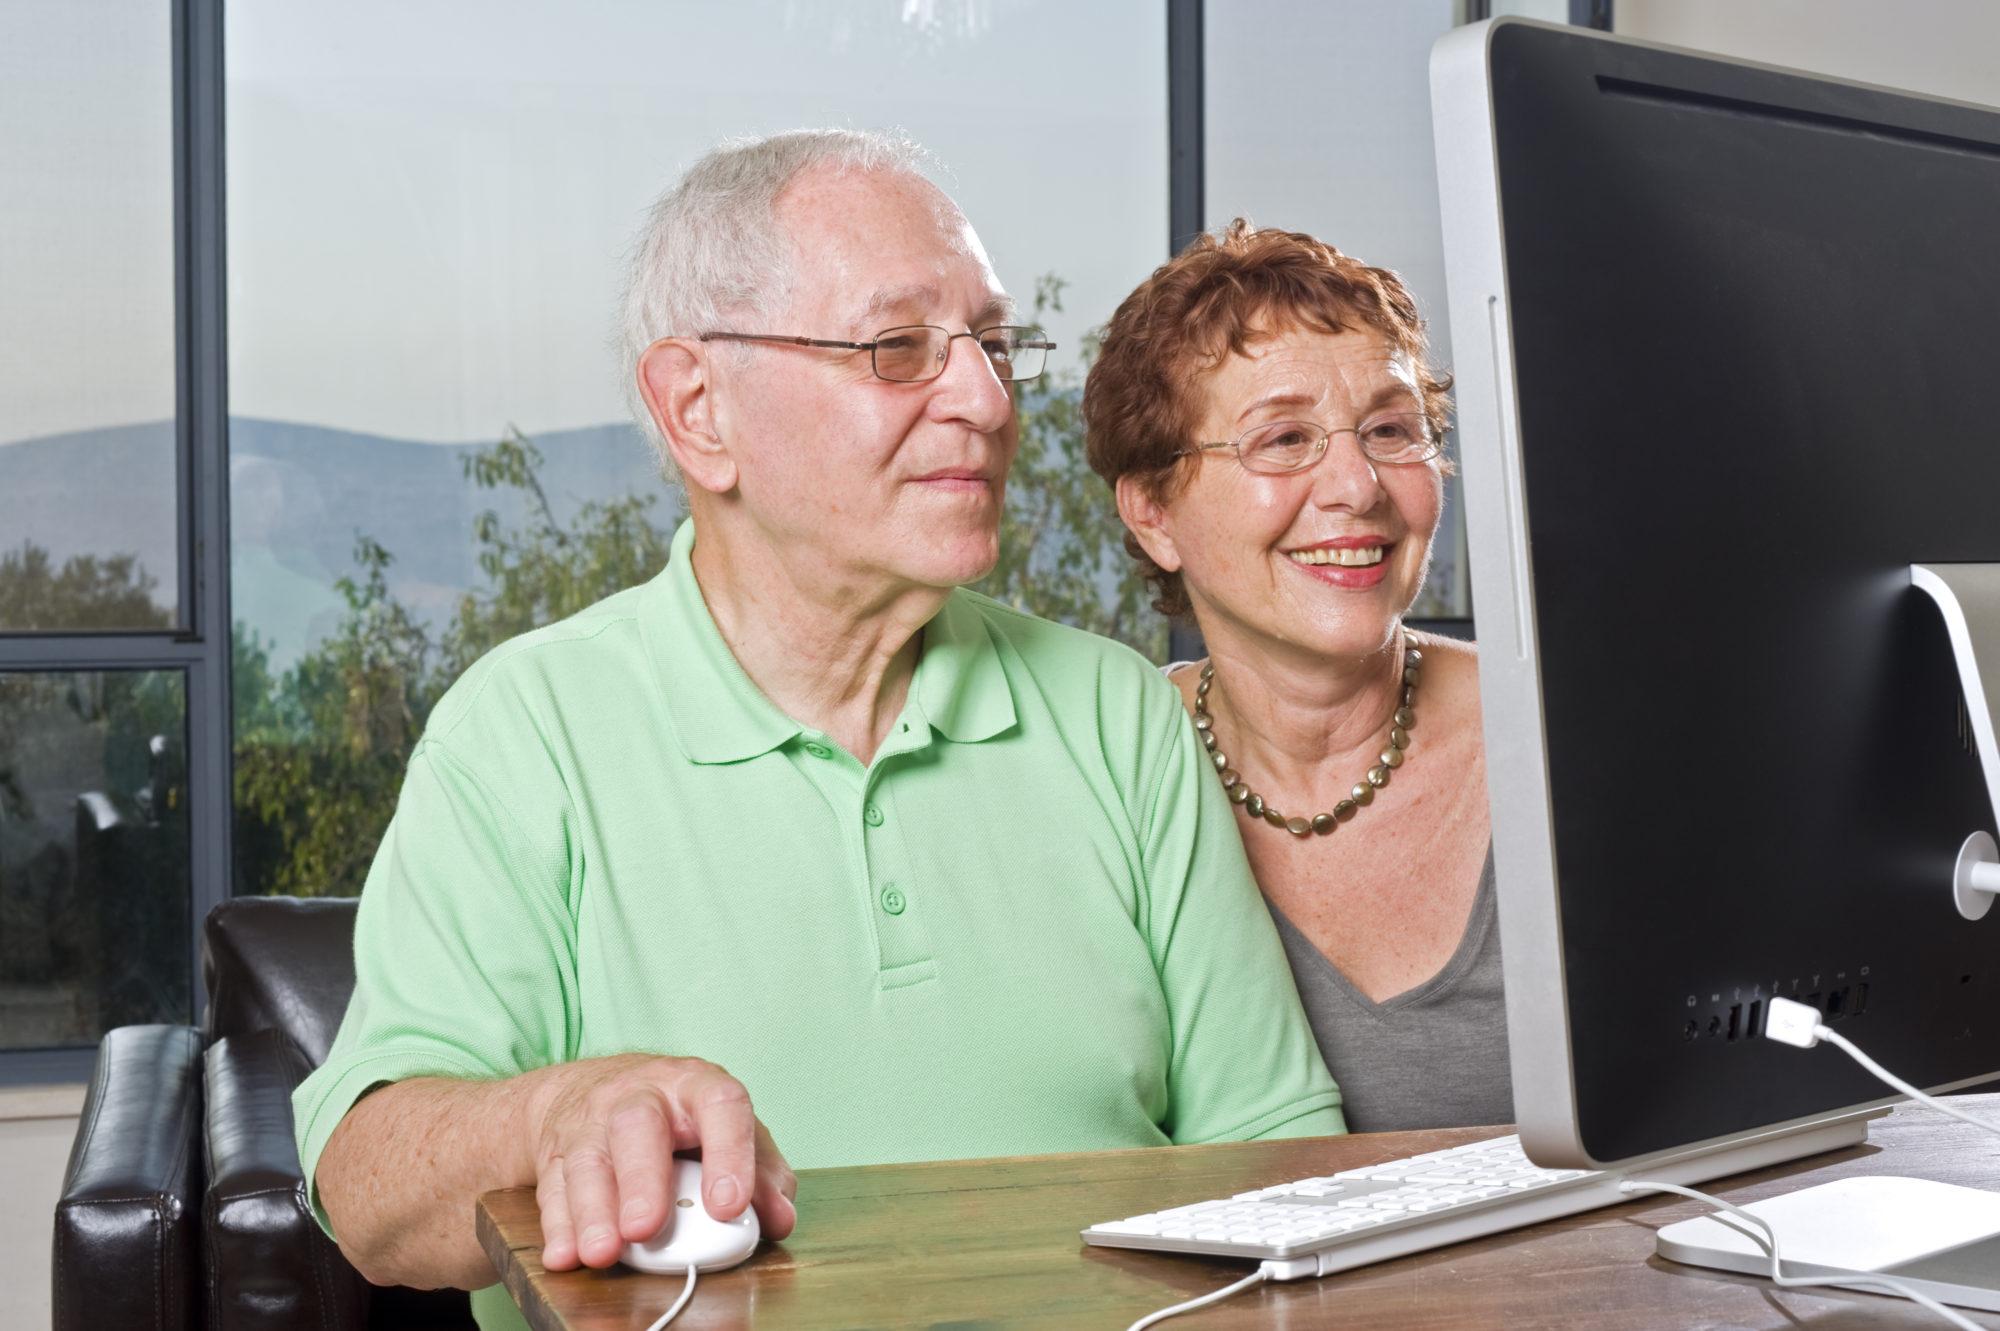 New York Catholic Seniors Dating Online Service